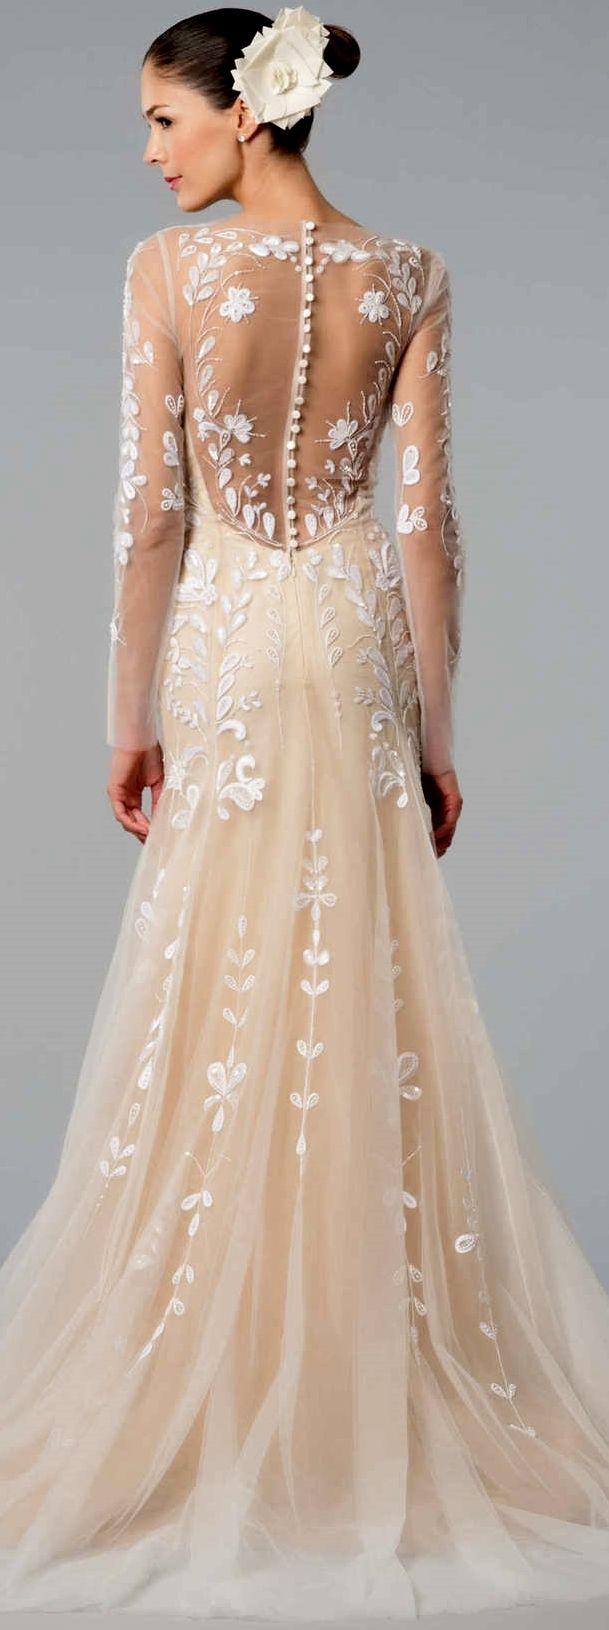 Sexy transparant back of toned sleek wedding dress - Carolina Herrera